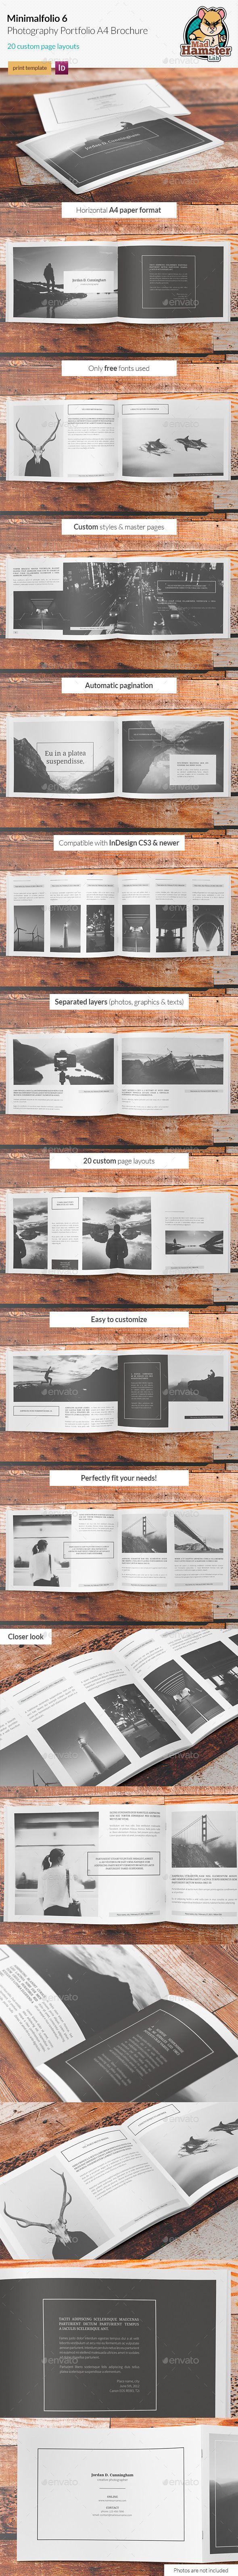 Minimalfolio 6 Photography Portfolio A4 Brochure Template InDesign INDD #design Download: http://graphicriver.net/item/minimalfolio-6-photography-portfolio-a4-brochure/13177981?ref=ksioks